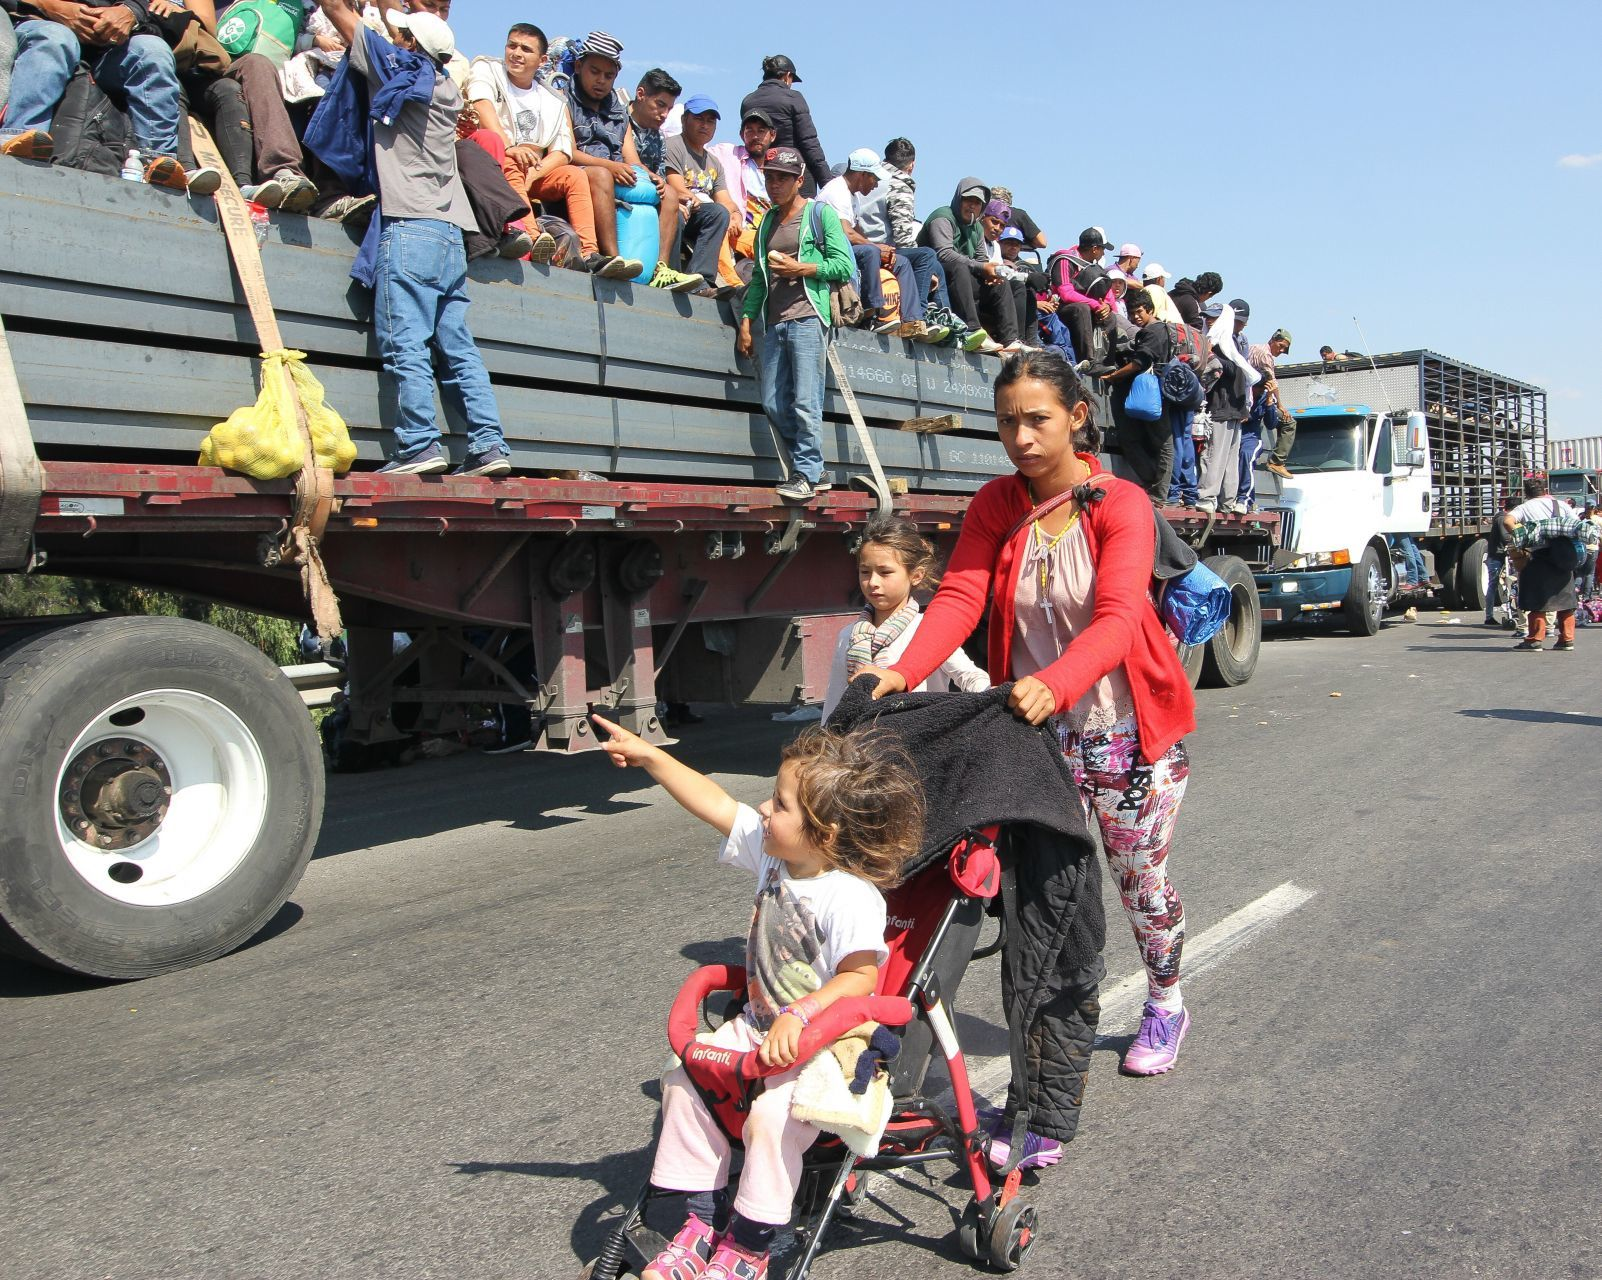 Biden prohíbe detener a migrantes embarazadas, en lactancia o posparto